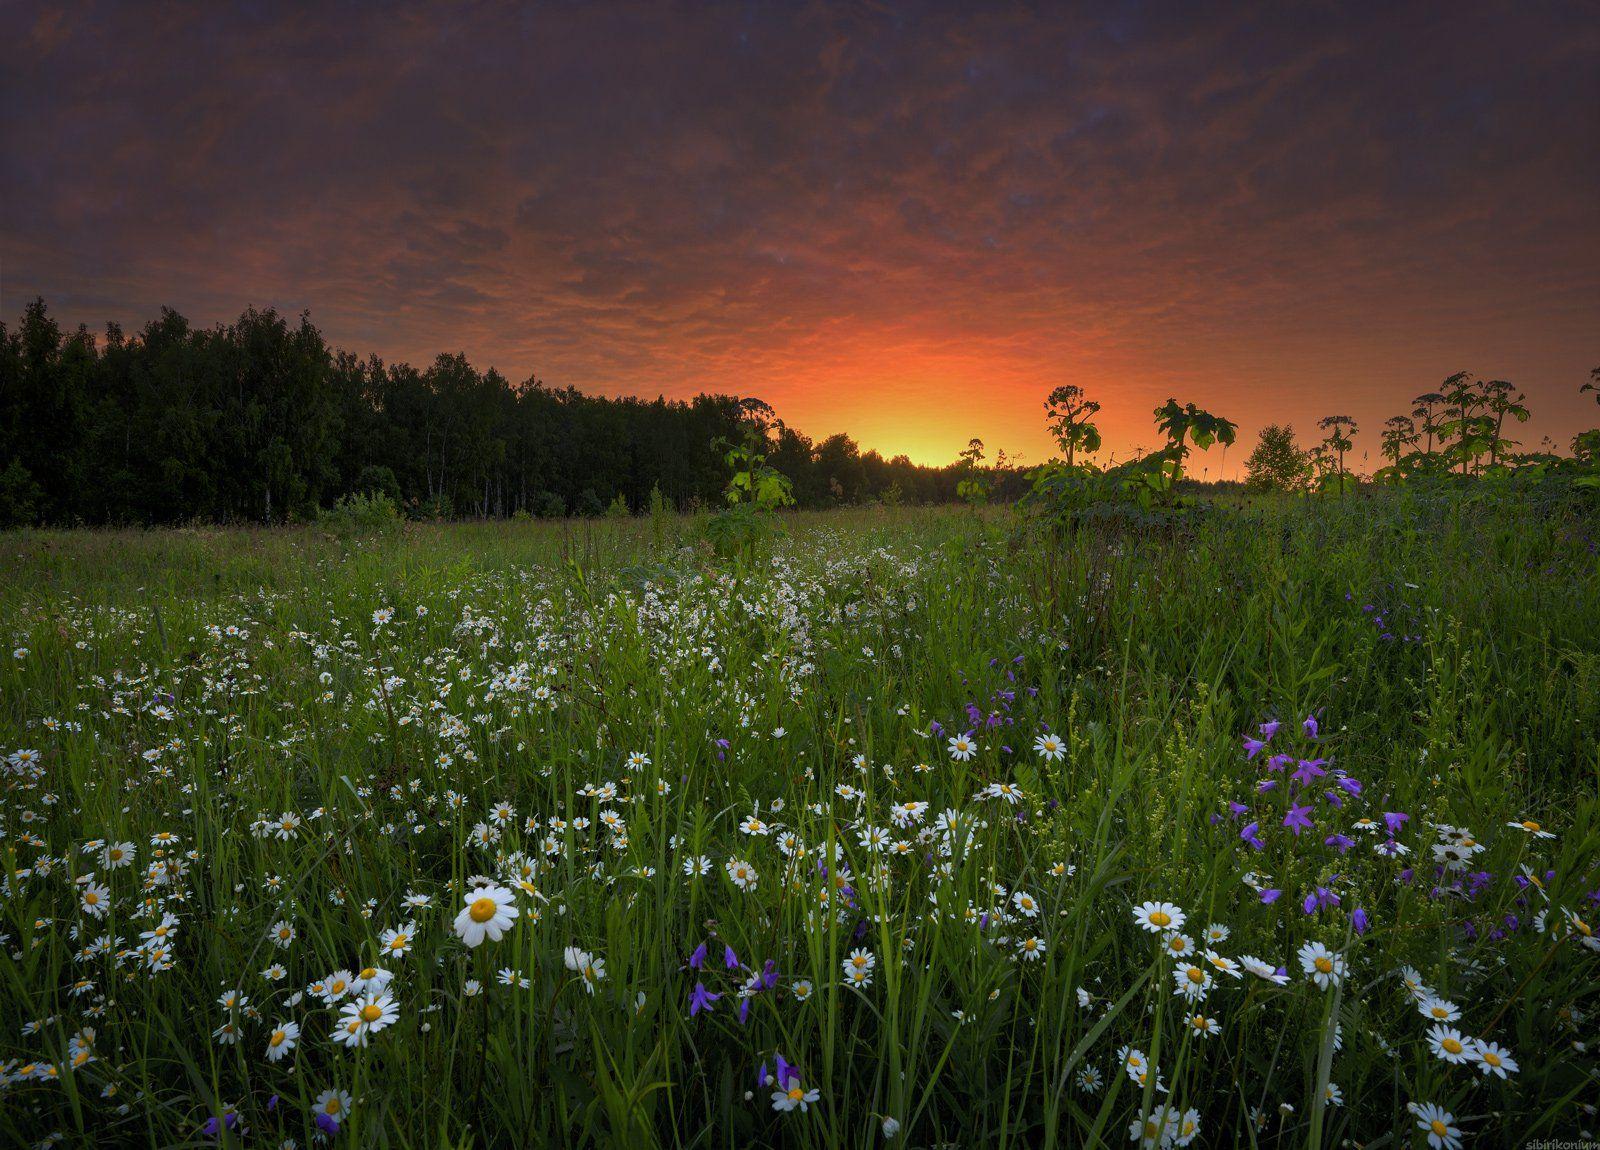 #пейзаж #лето #утро #подмосковье #красиво, Морозов Юрий